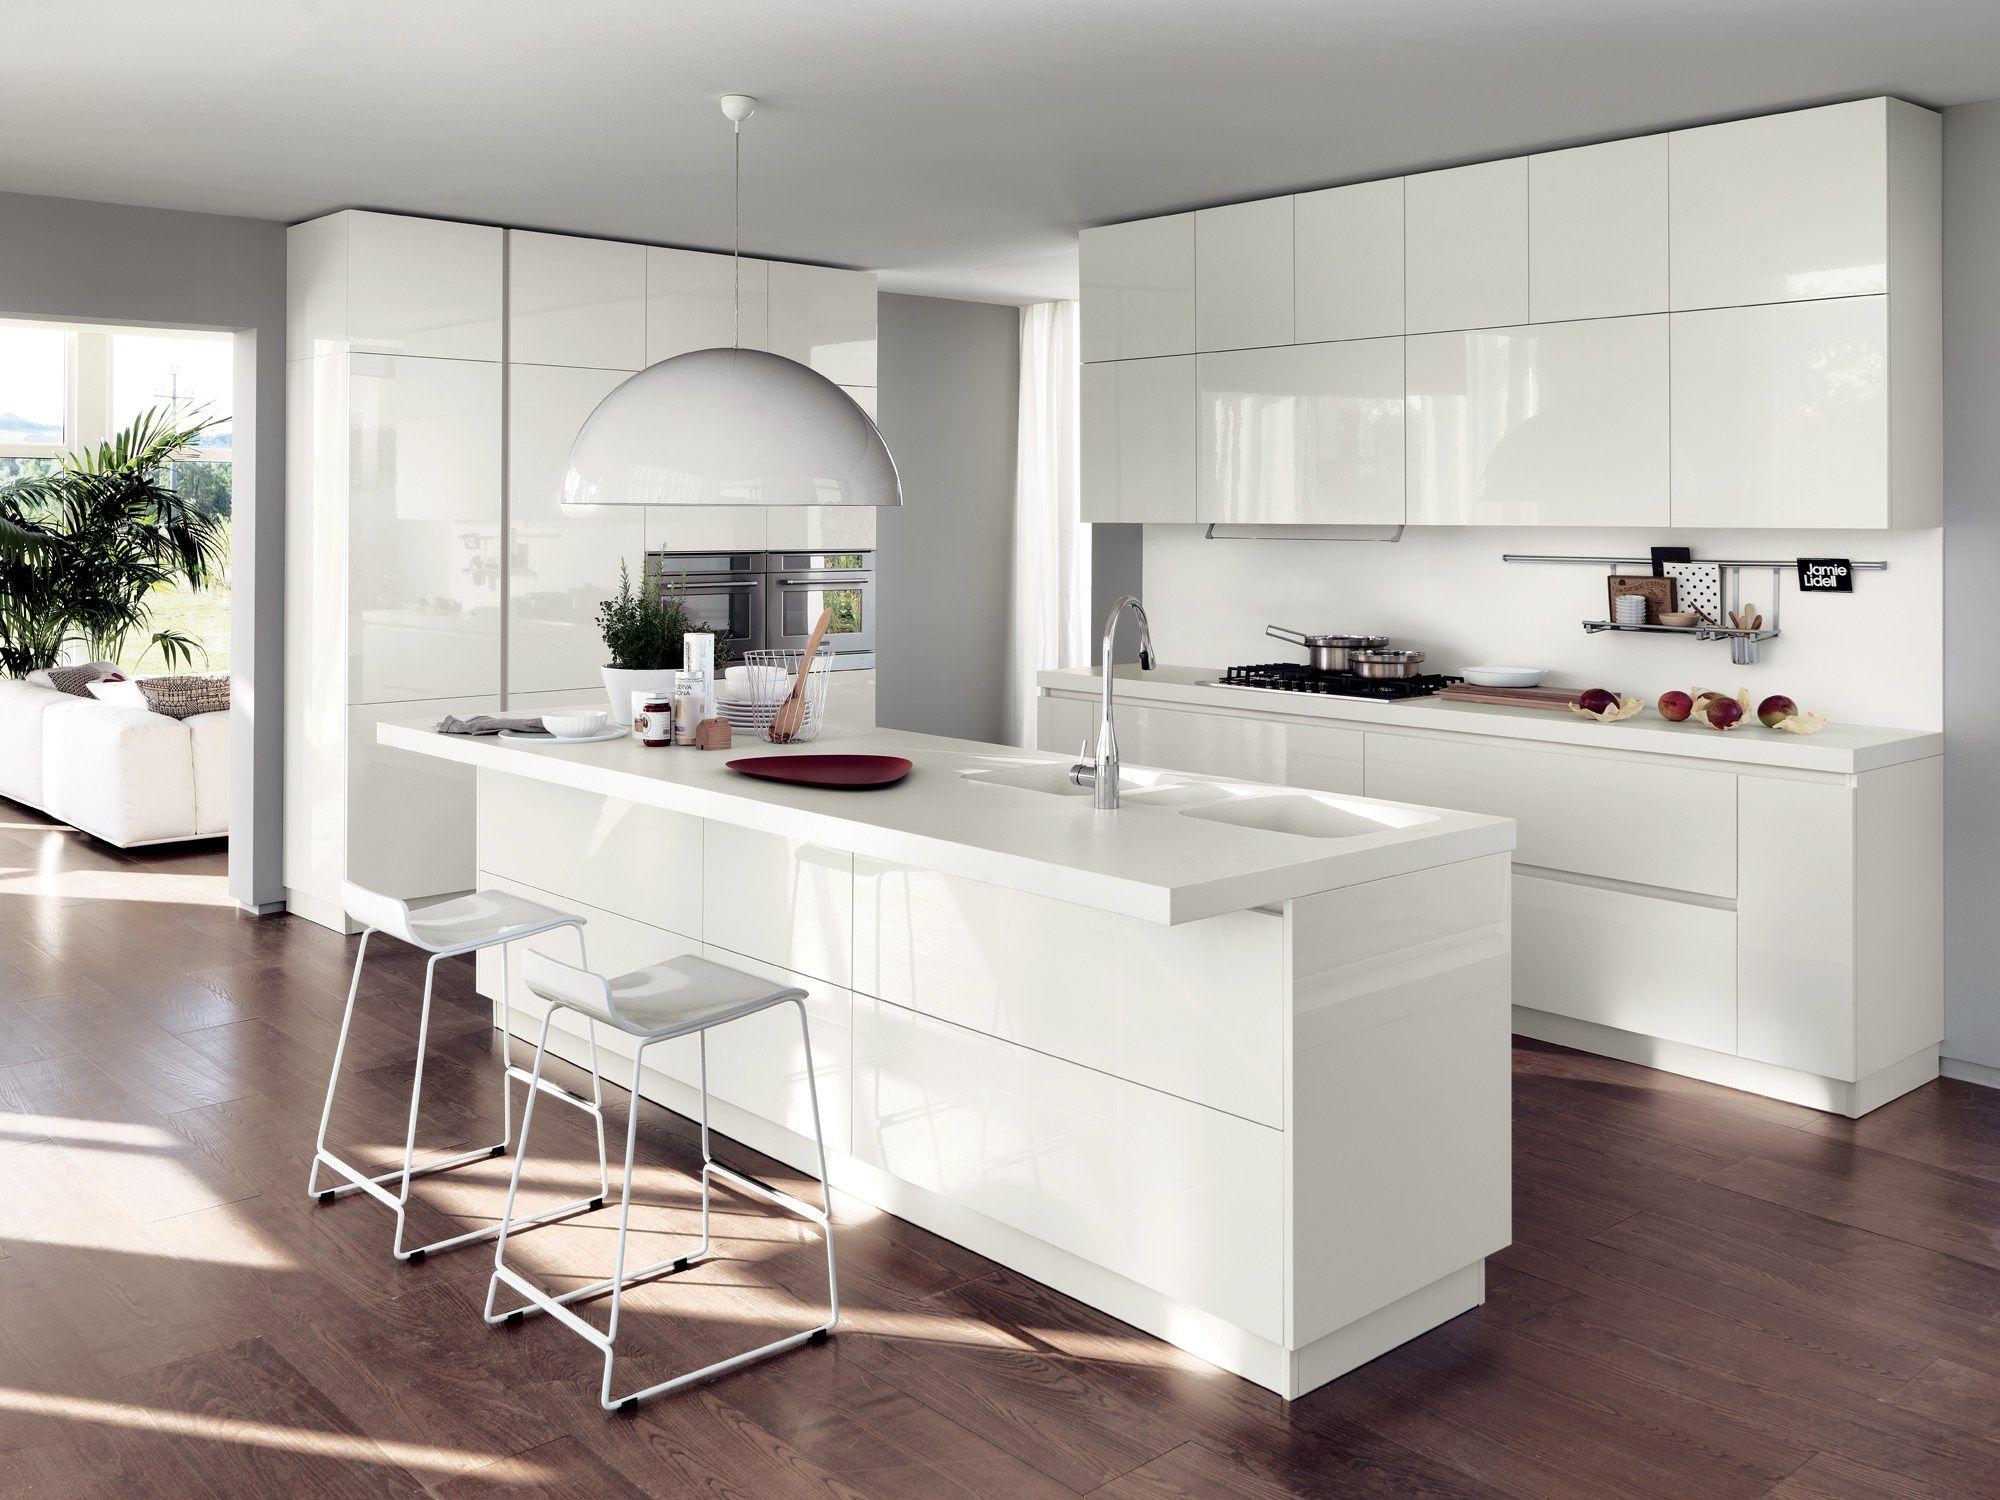 Mesmerizing 30 Scavolini Kitchens Inspiration Design Of